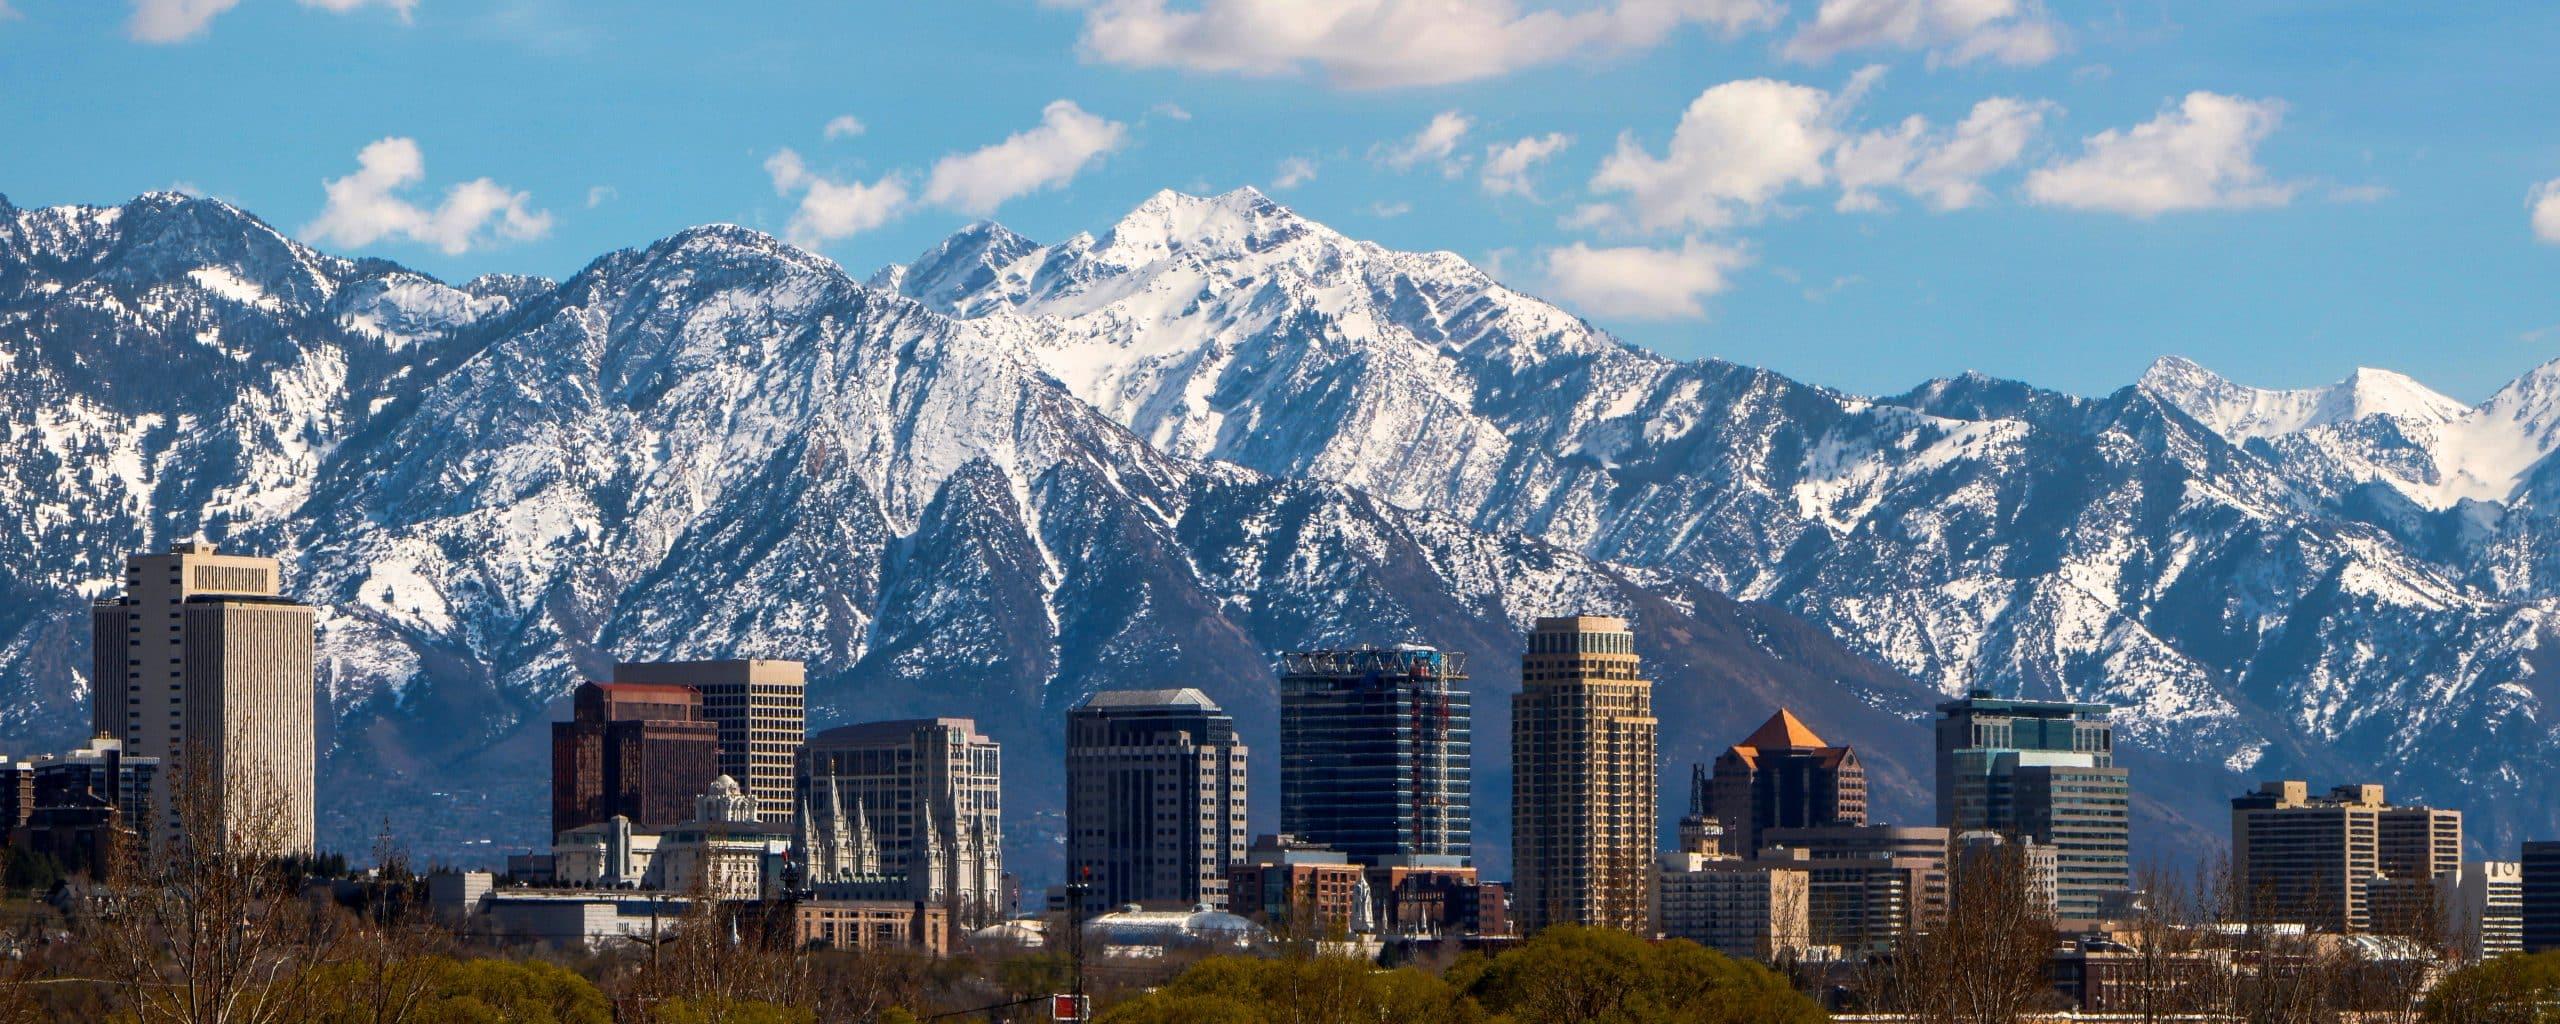 Salt Lake City mountains with snow